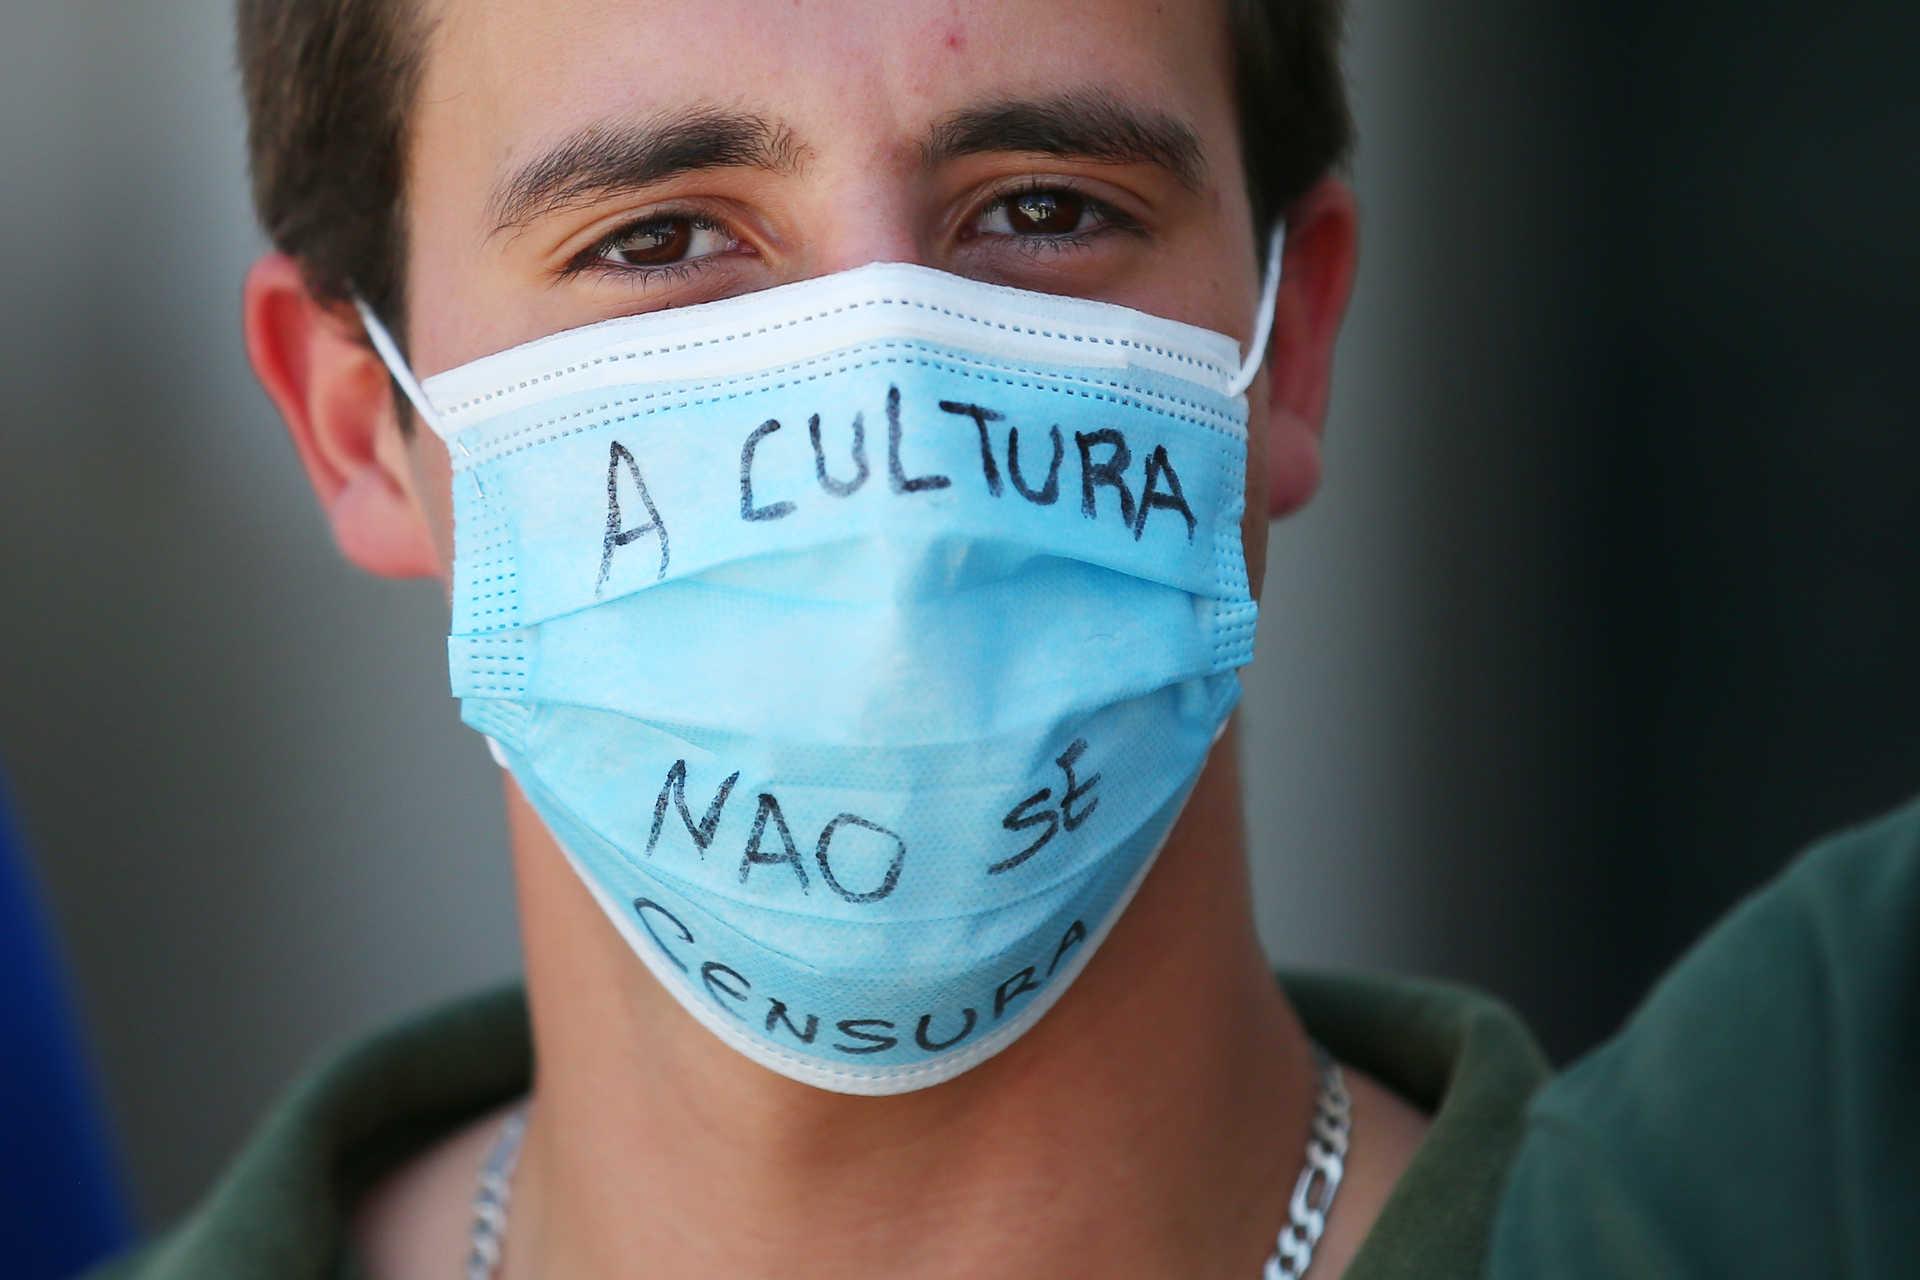 Forcados convocam protesto contra ″censura″ sobre touradas - JN